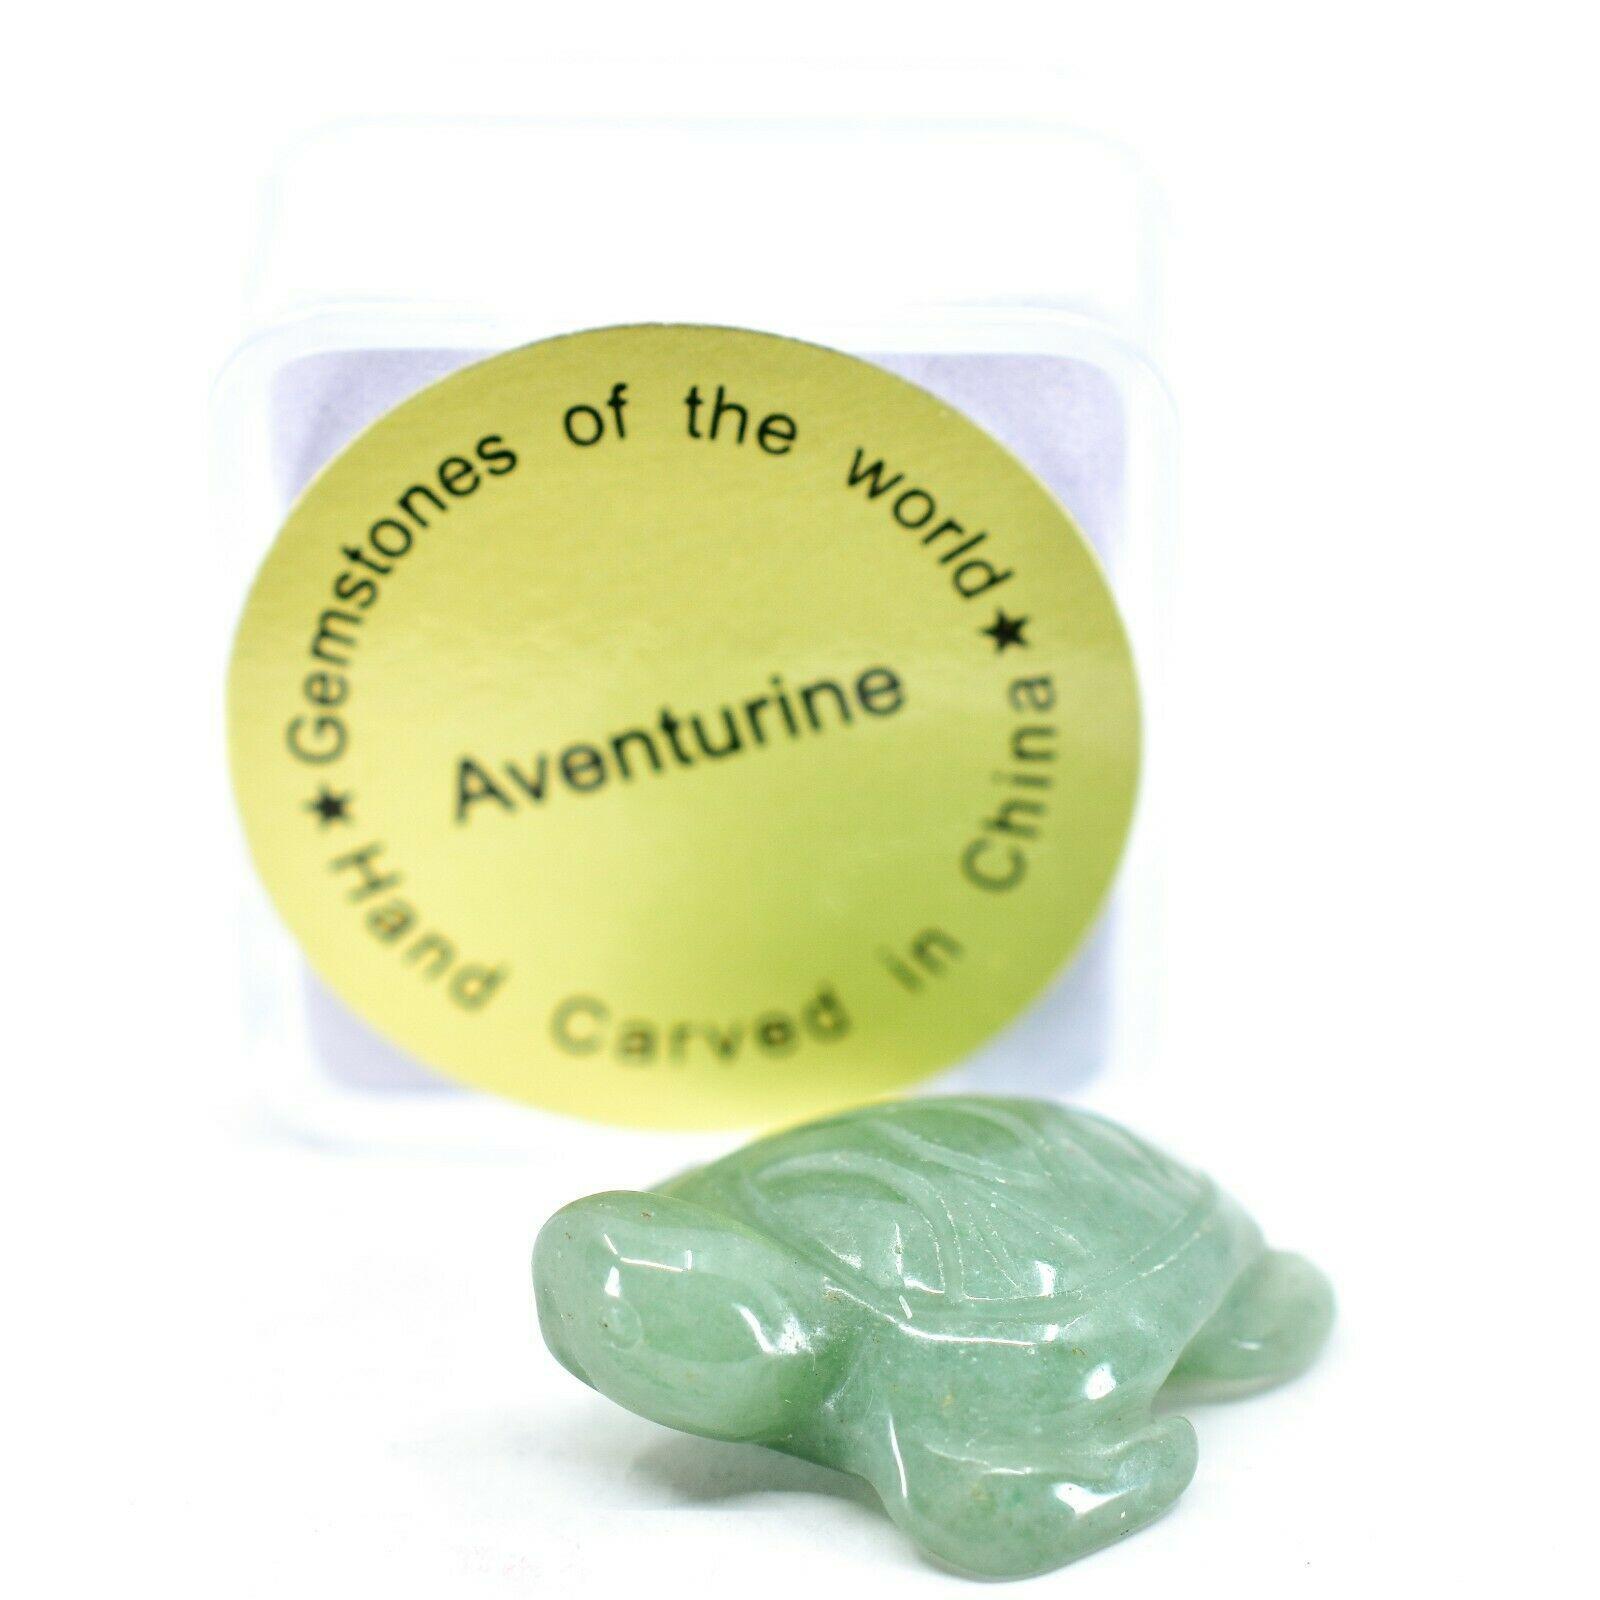 Aventurine Quartz Gemstone Miniature Sea Turtle Figurine Hand Carved in China